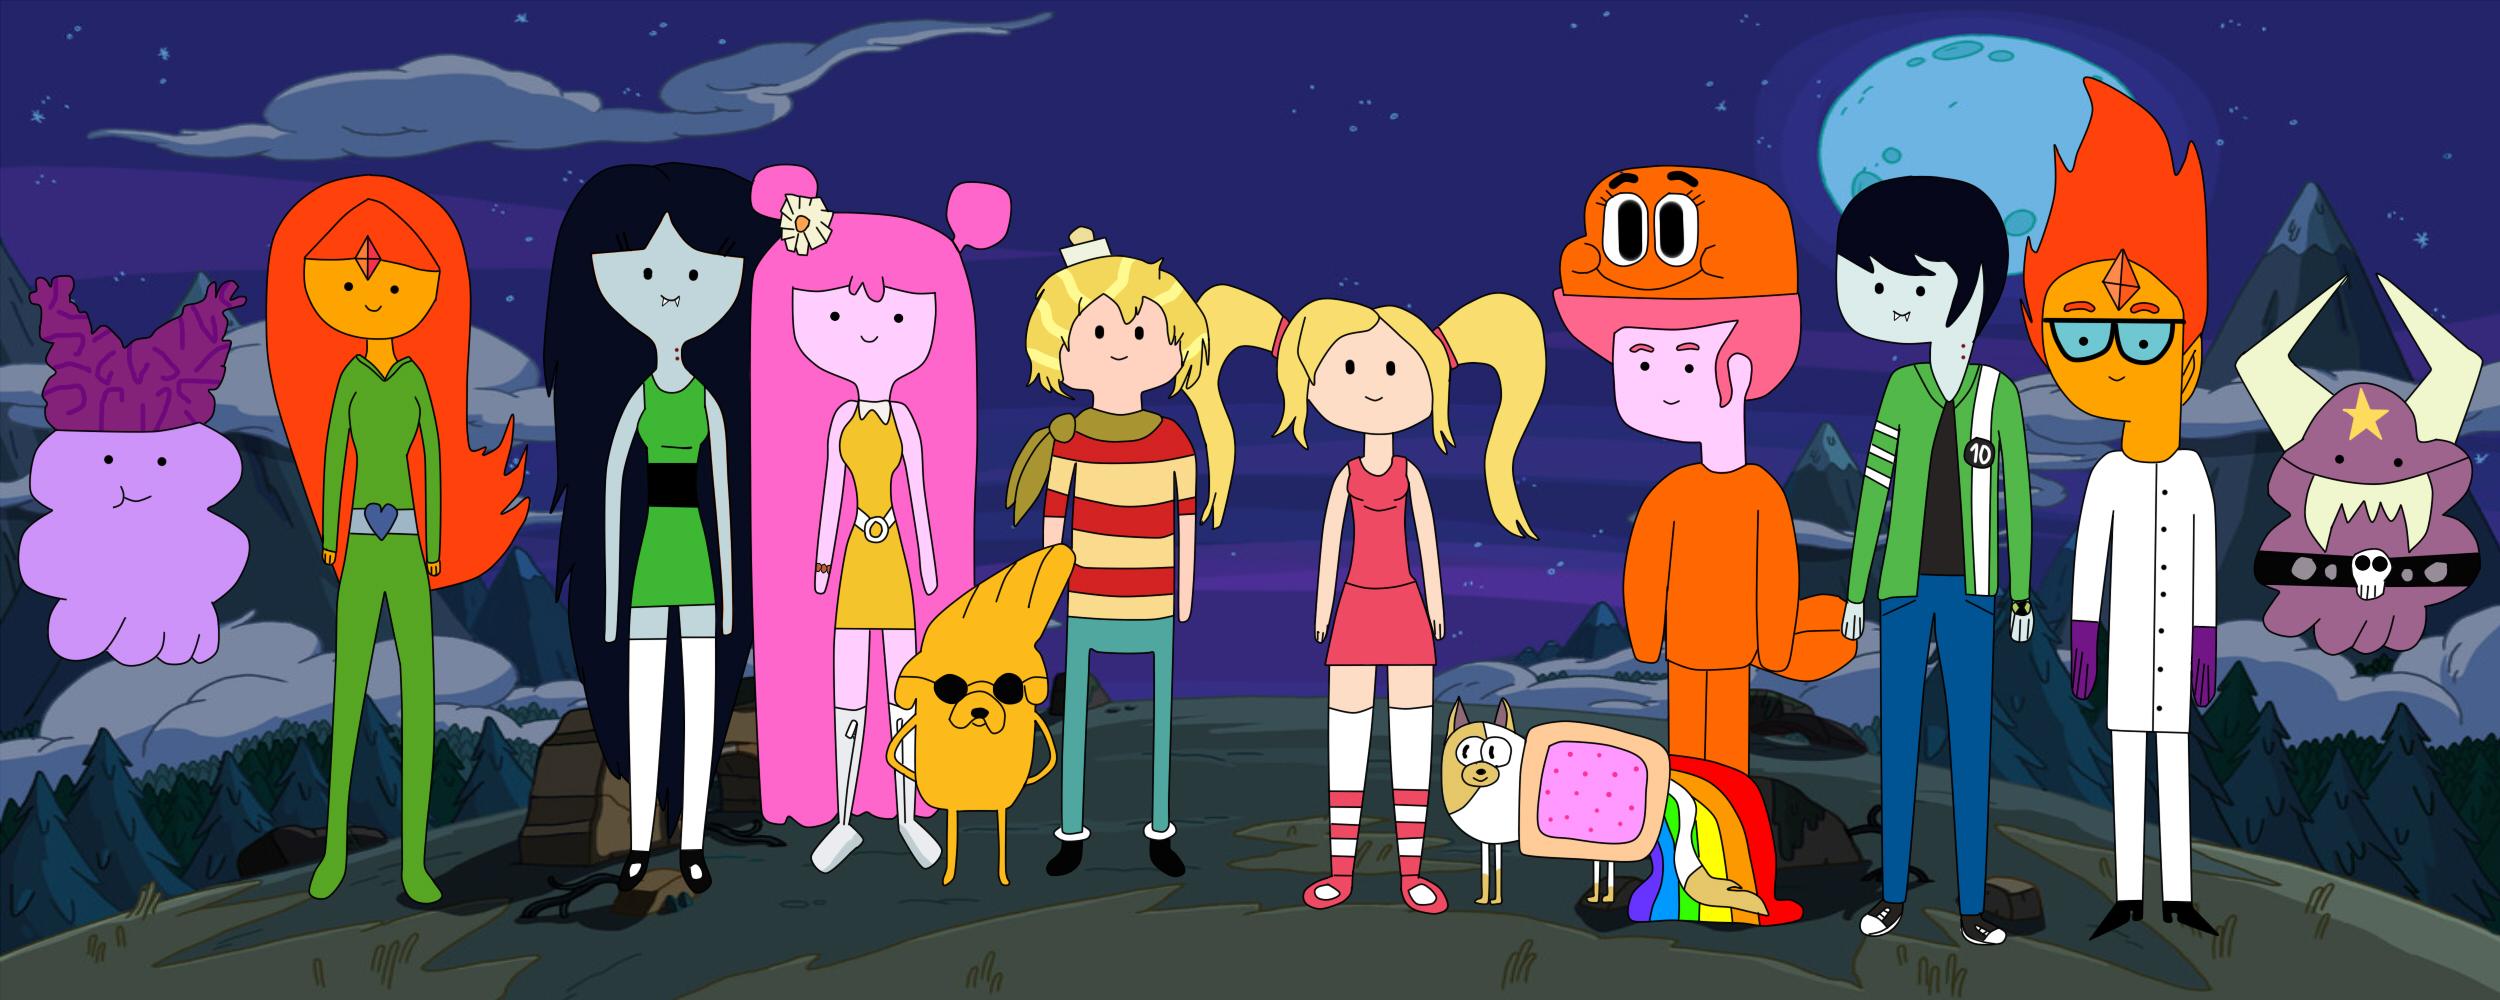 Adventure time - Halloween by zenzatsionen on DeviantArt